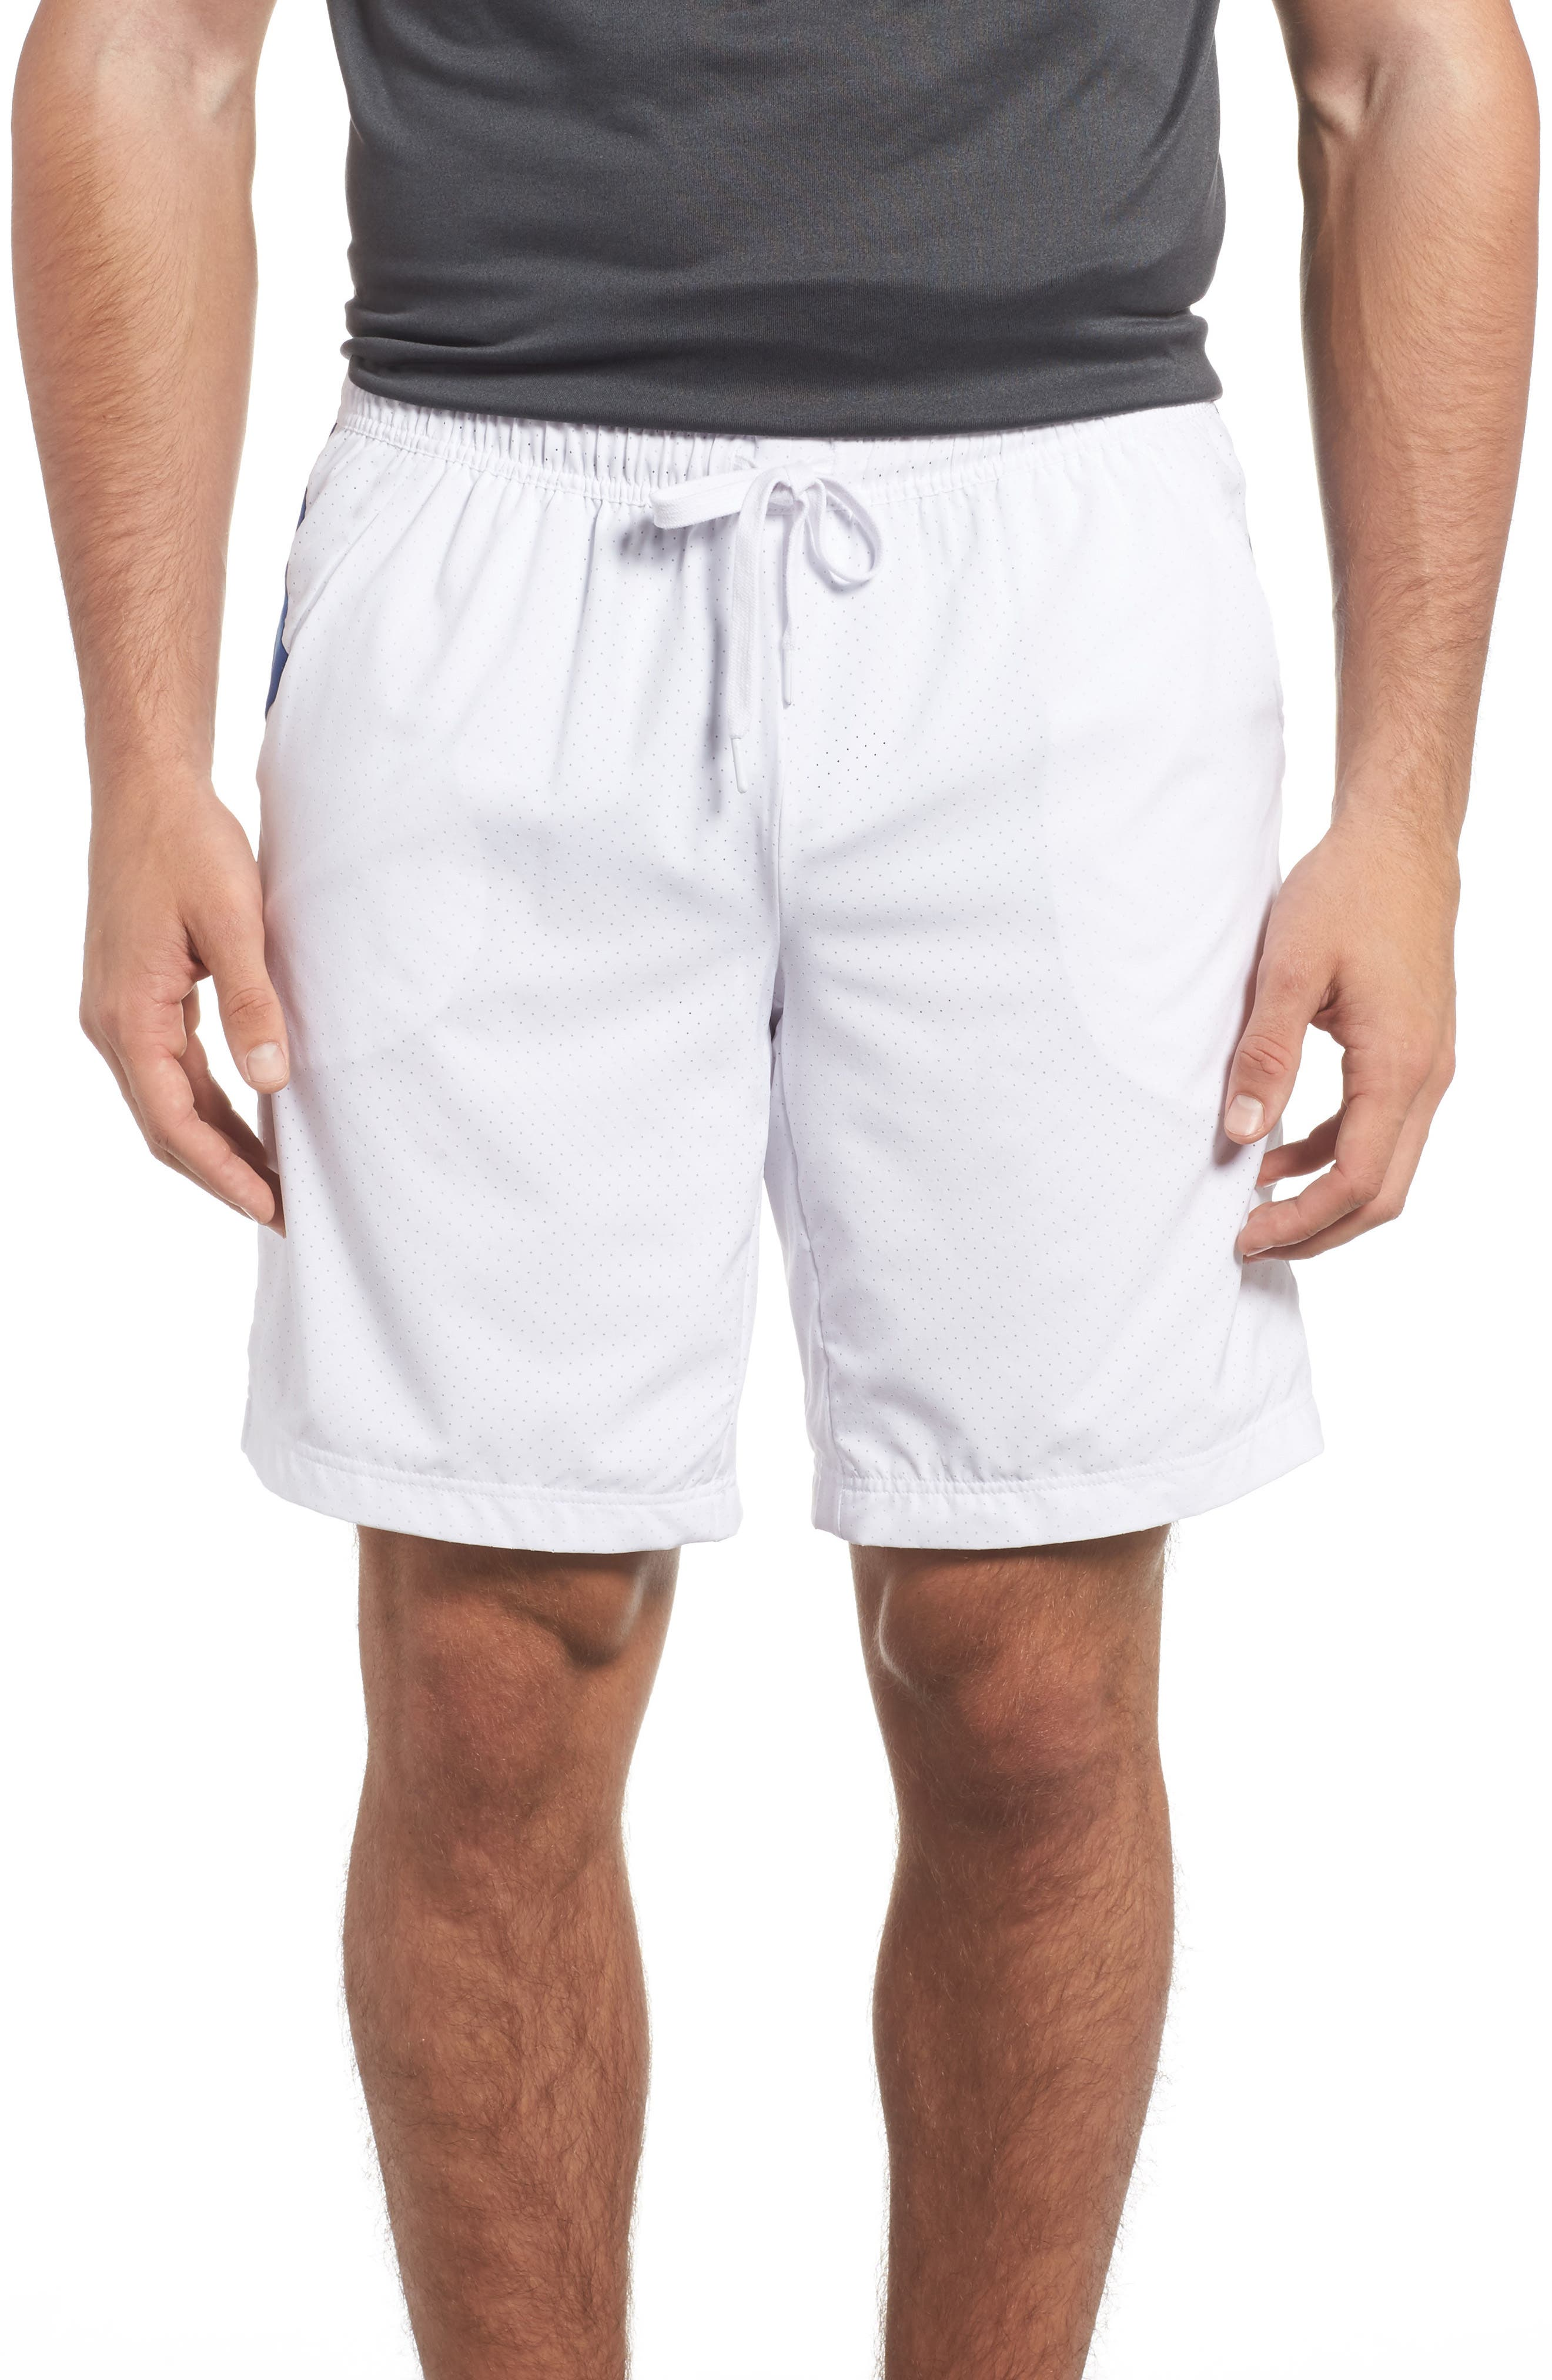 2(x)ist Mesh Shorts